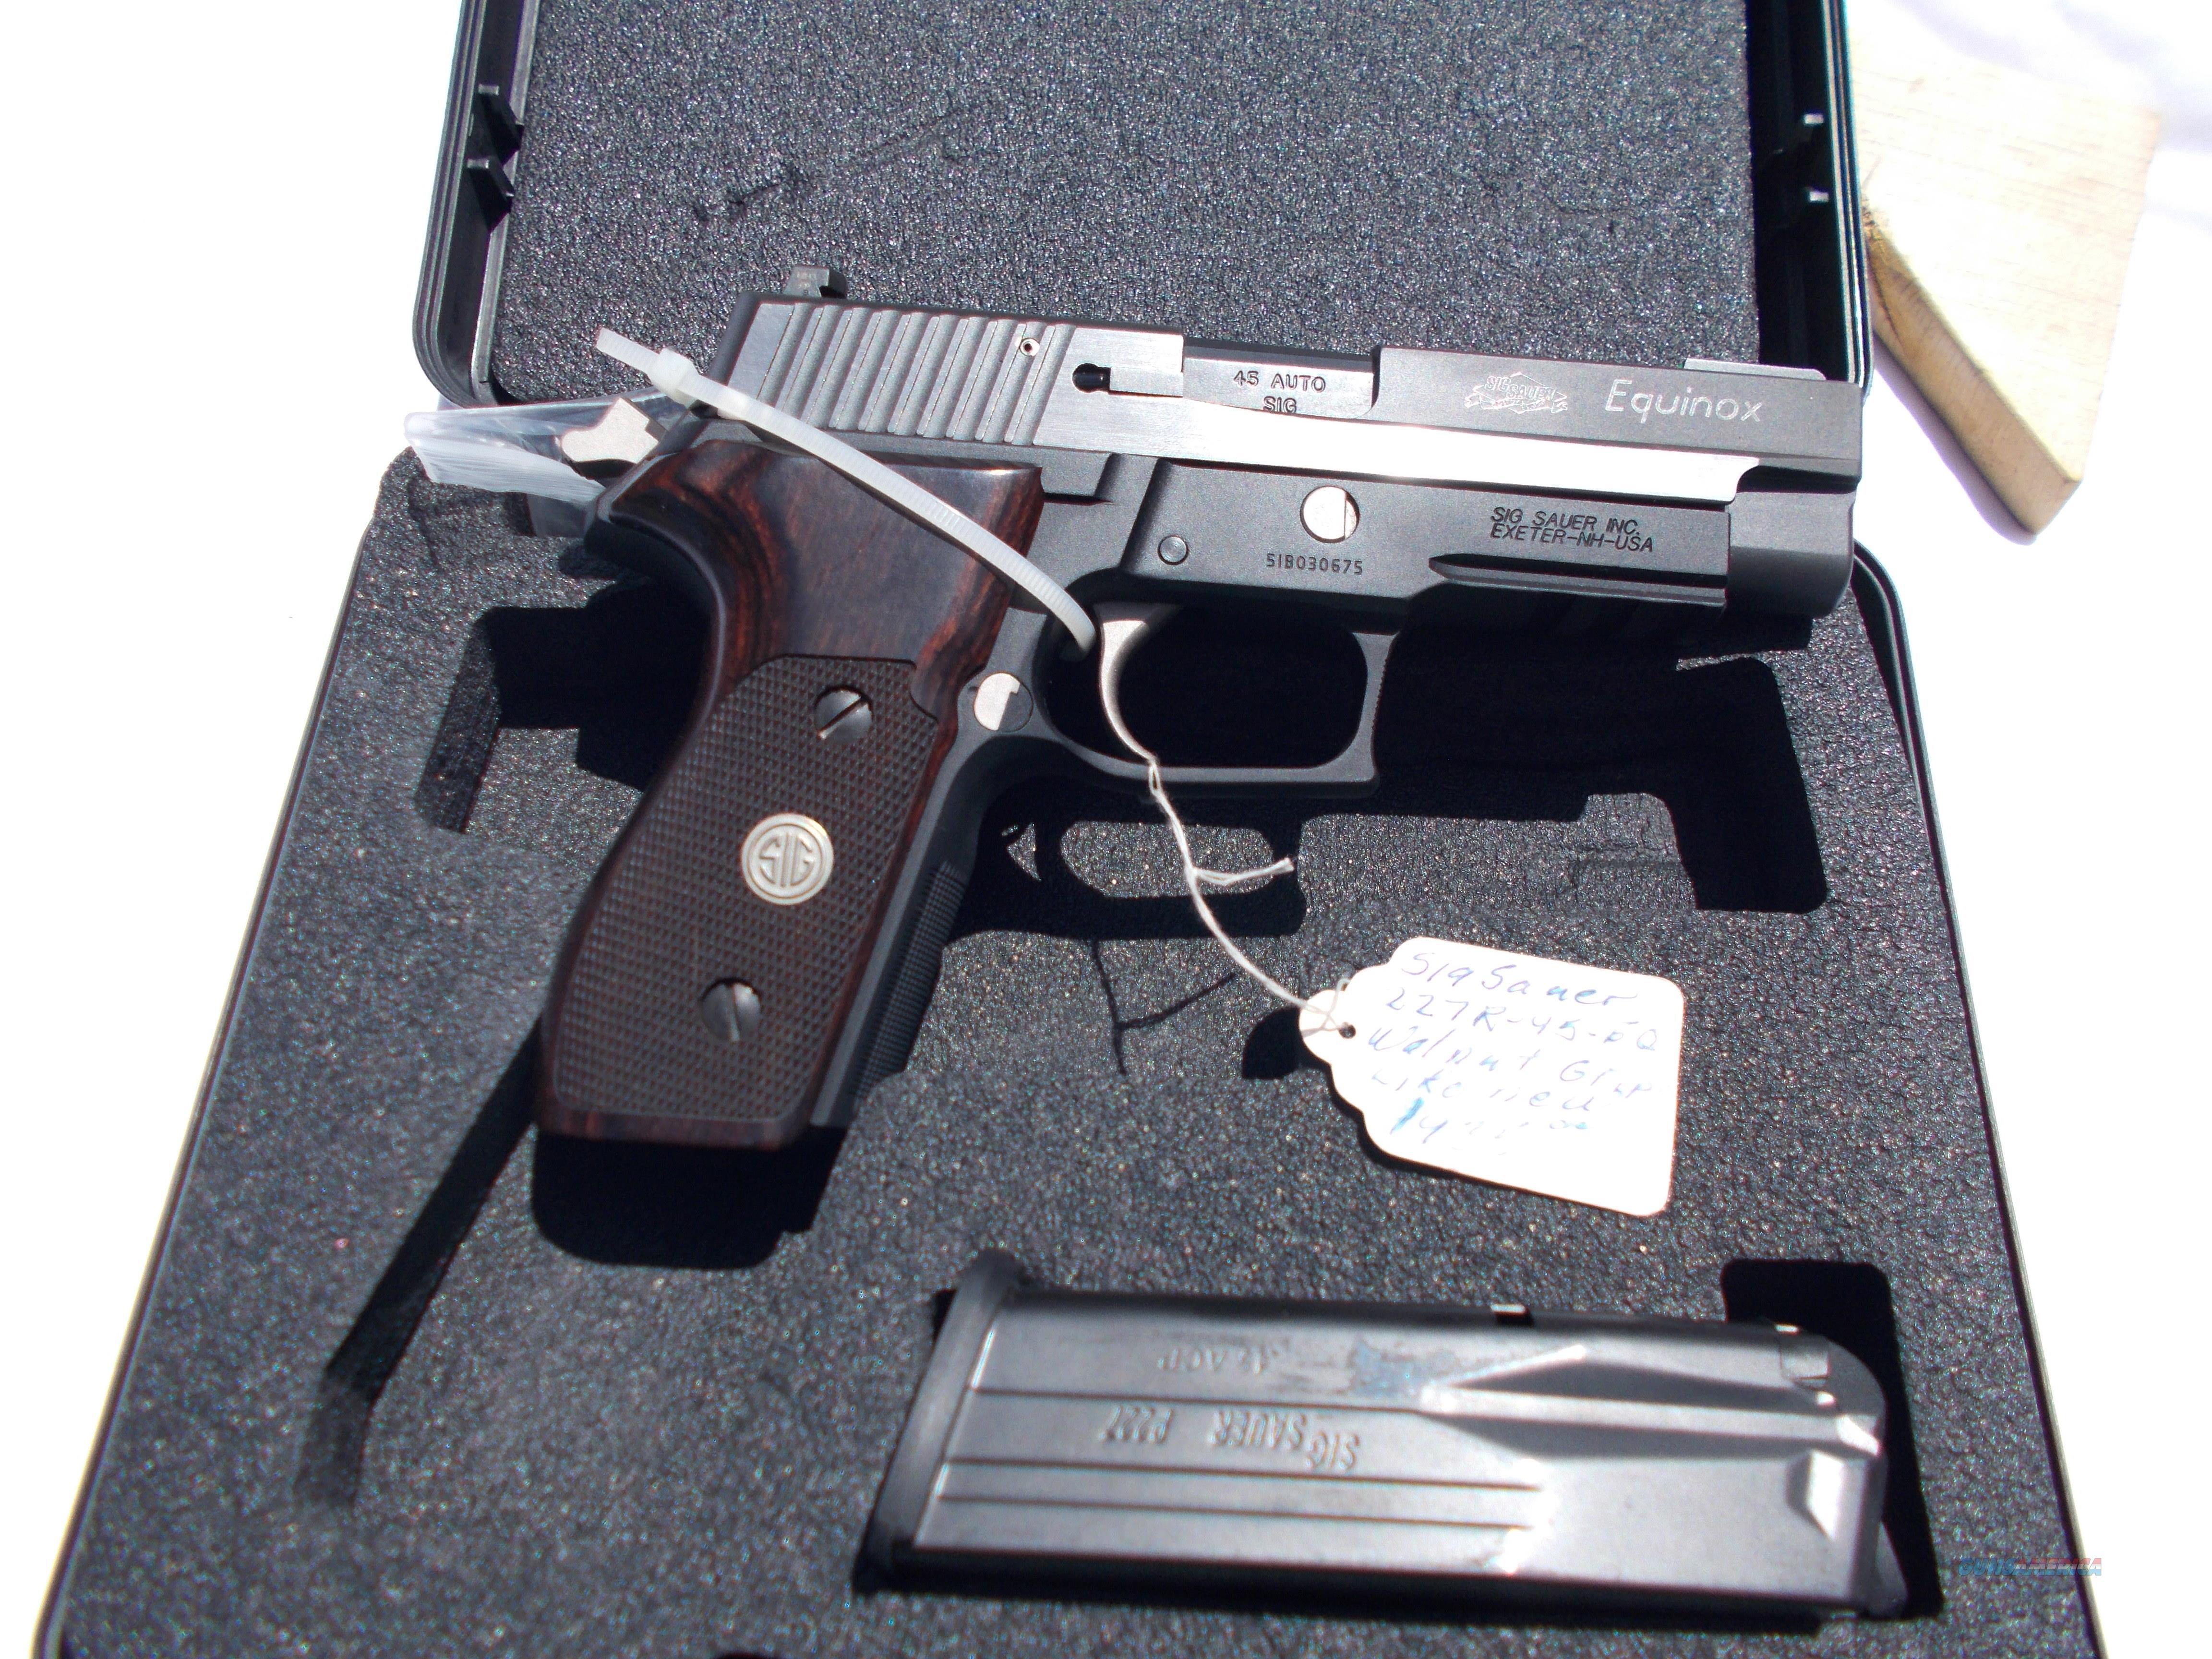 sig sauer p227 equinox 45acp  Guns > Pistols